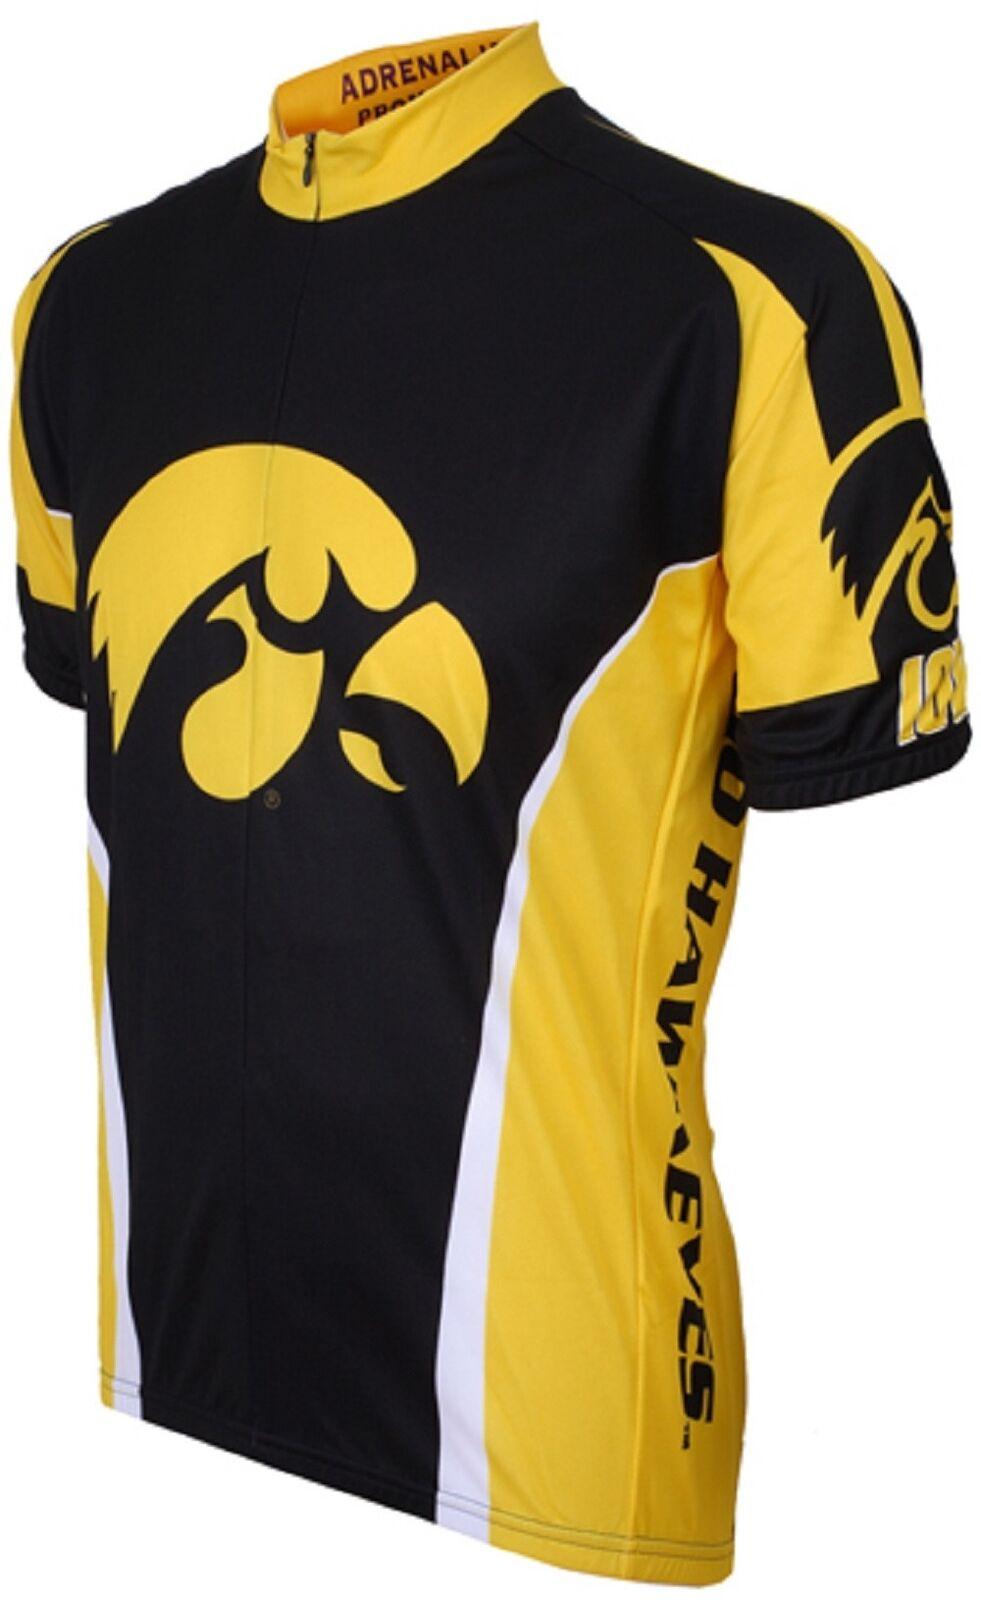 NCAA Herren Adrenaline Promotions Iowa Hawkeyes Straße Fahrrad Trikot